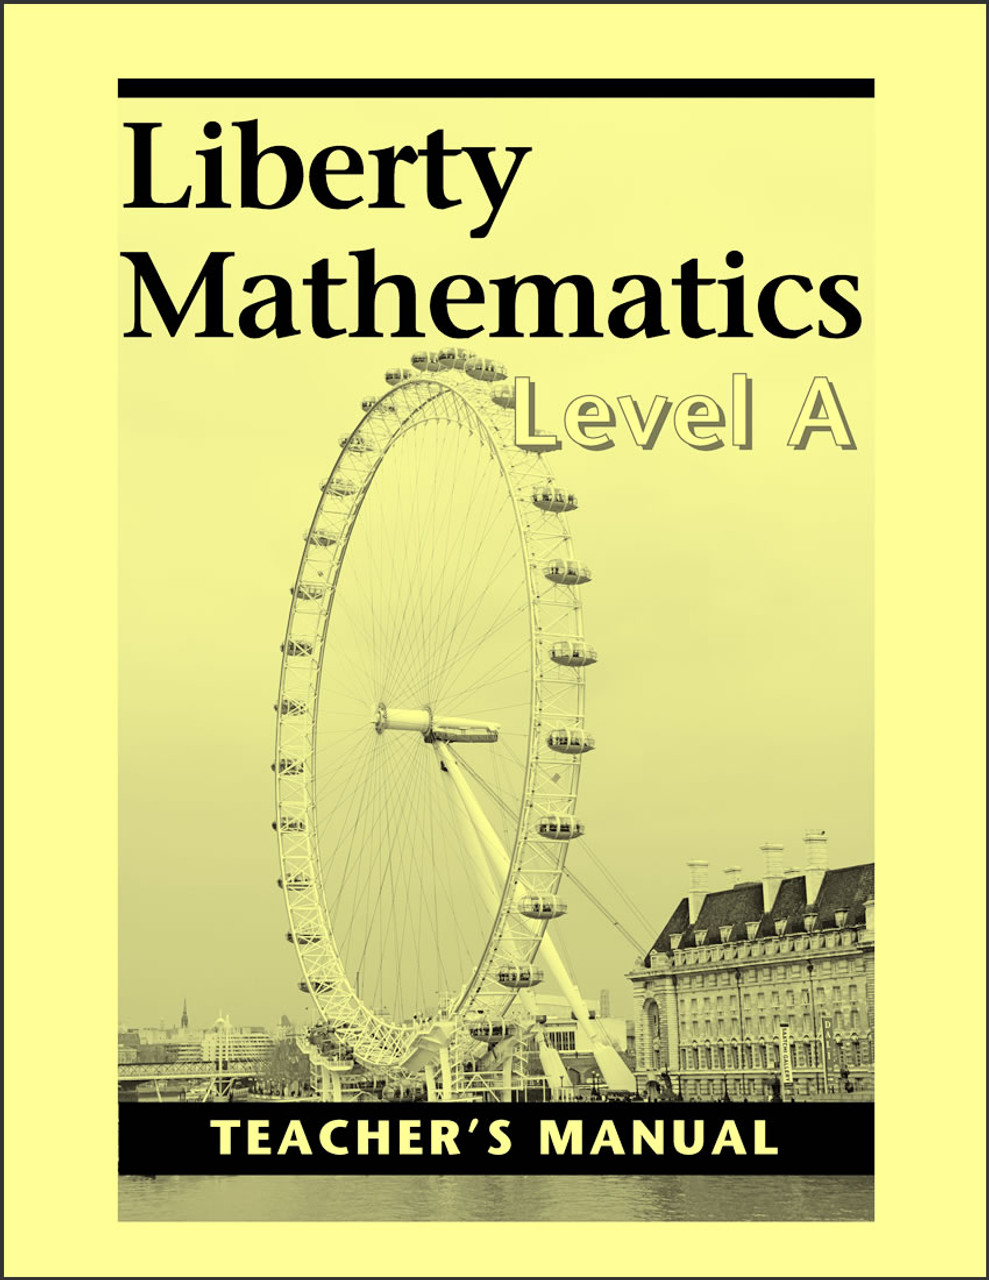 Liberty Mathematics: Level A - Teacher's Manual